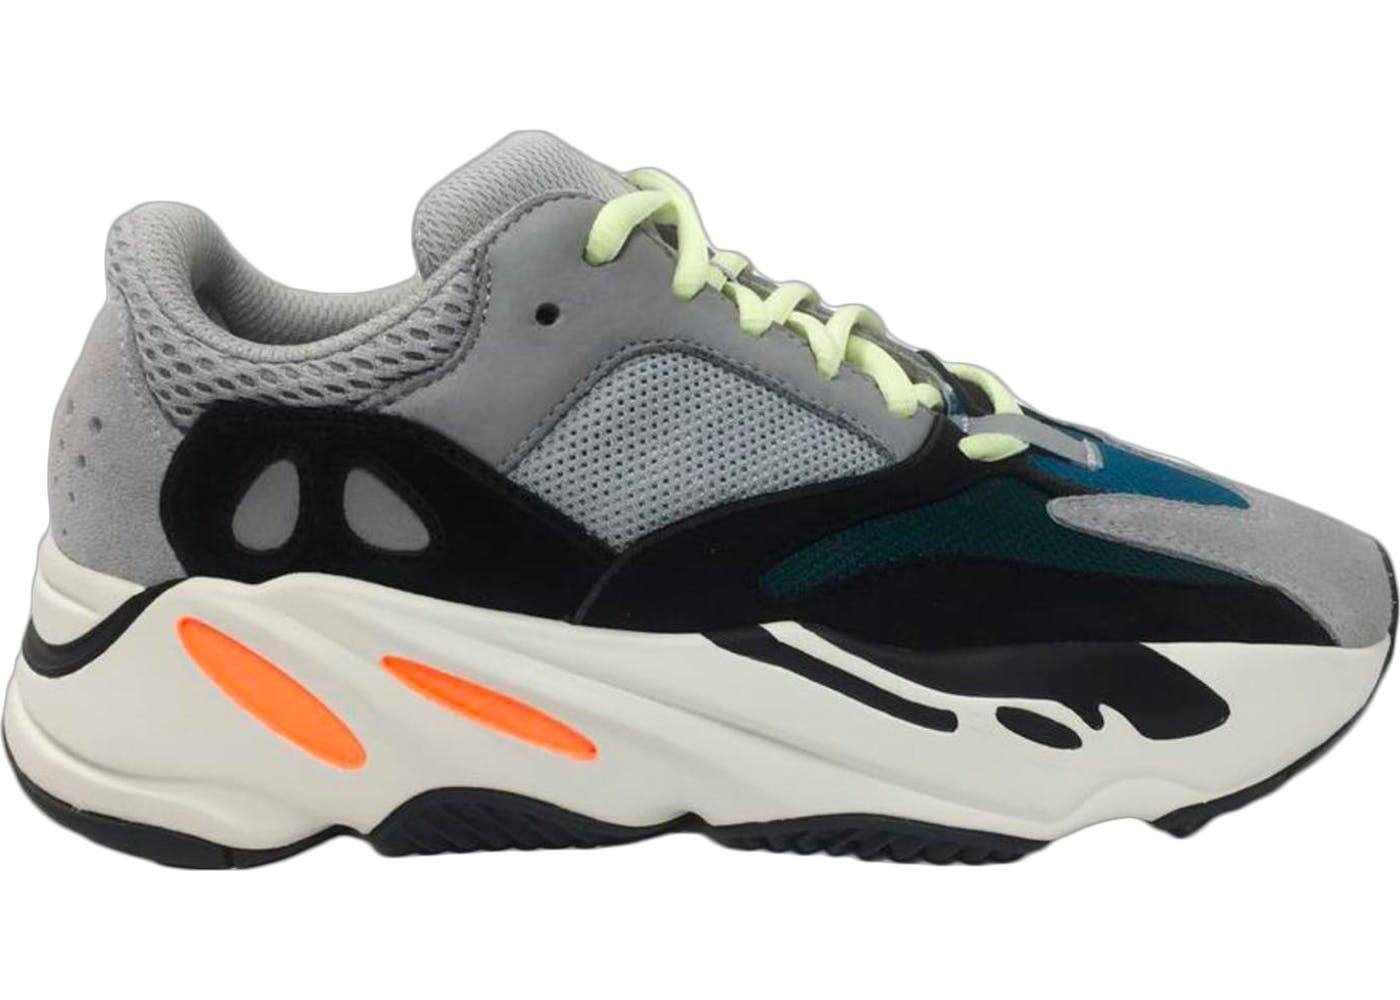 super popular 9ea42 d54d8 Adidas-Yeezy-Wave-Runner-700-Solid-Grey - WearTesters